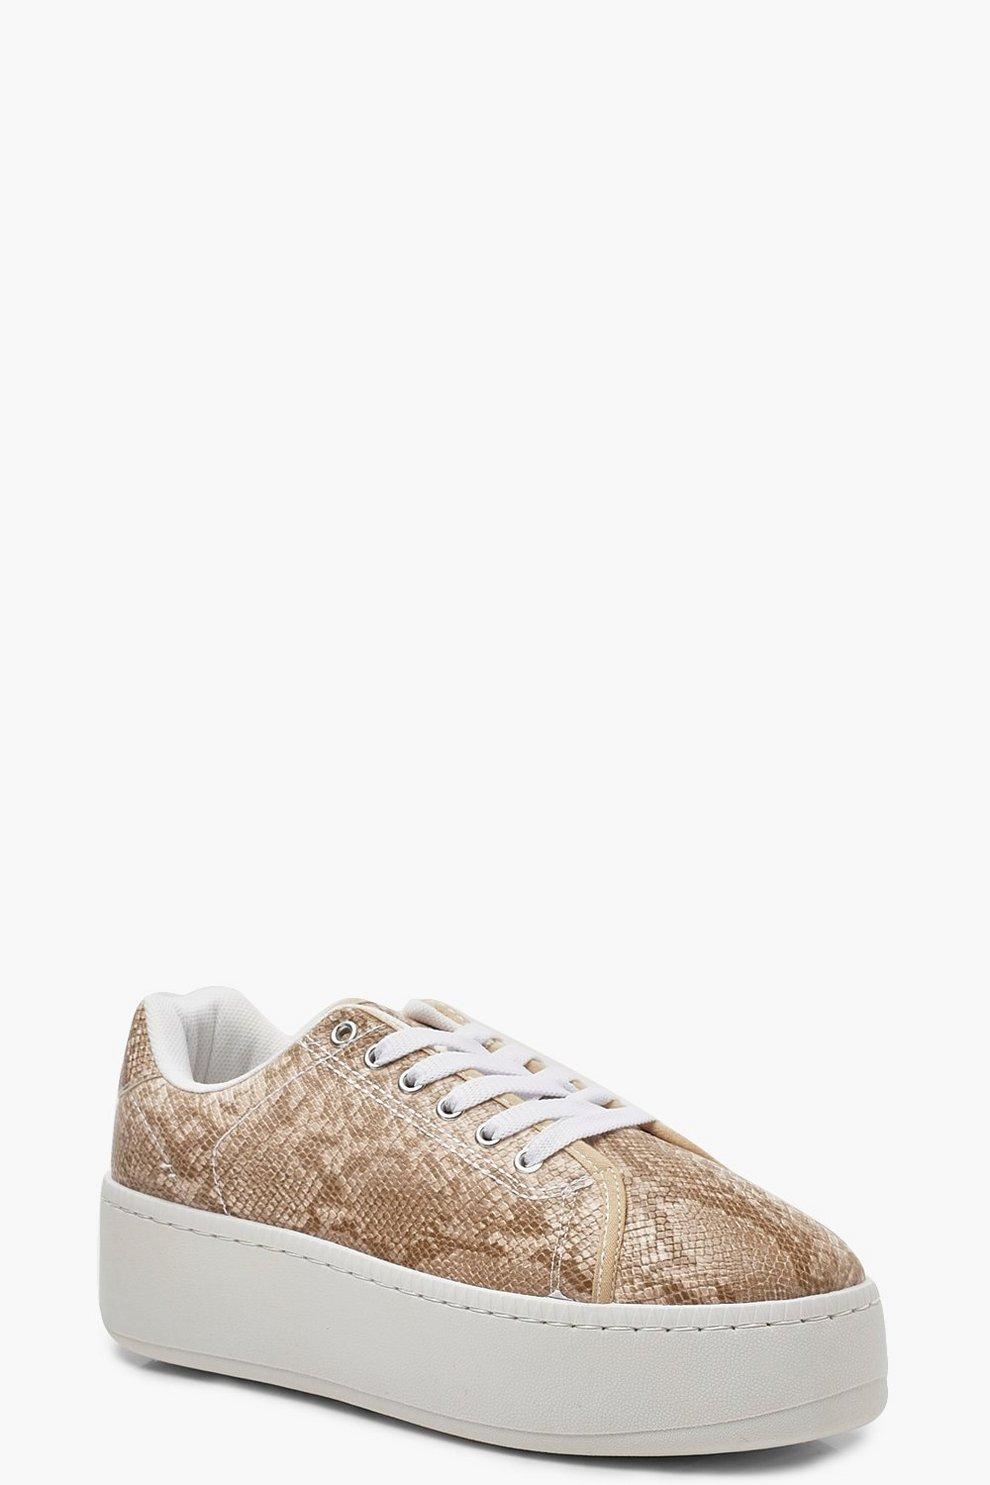 377c6c09869aaa Plateau-Sneaker mit Schlangenmuster